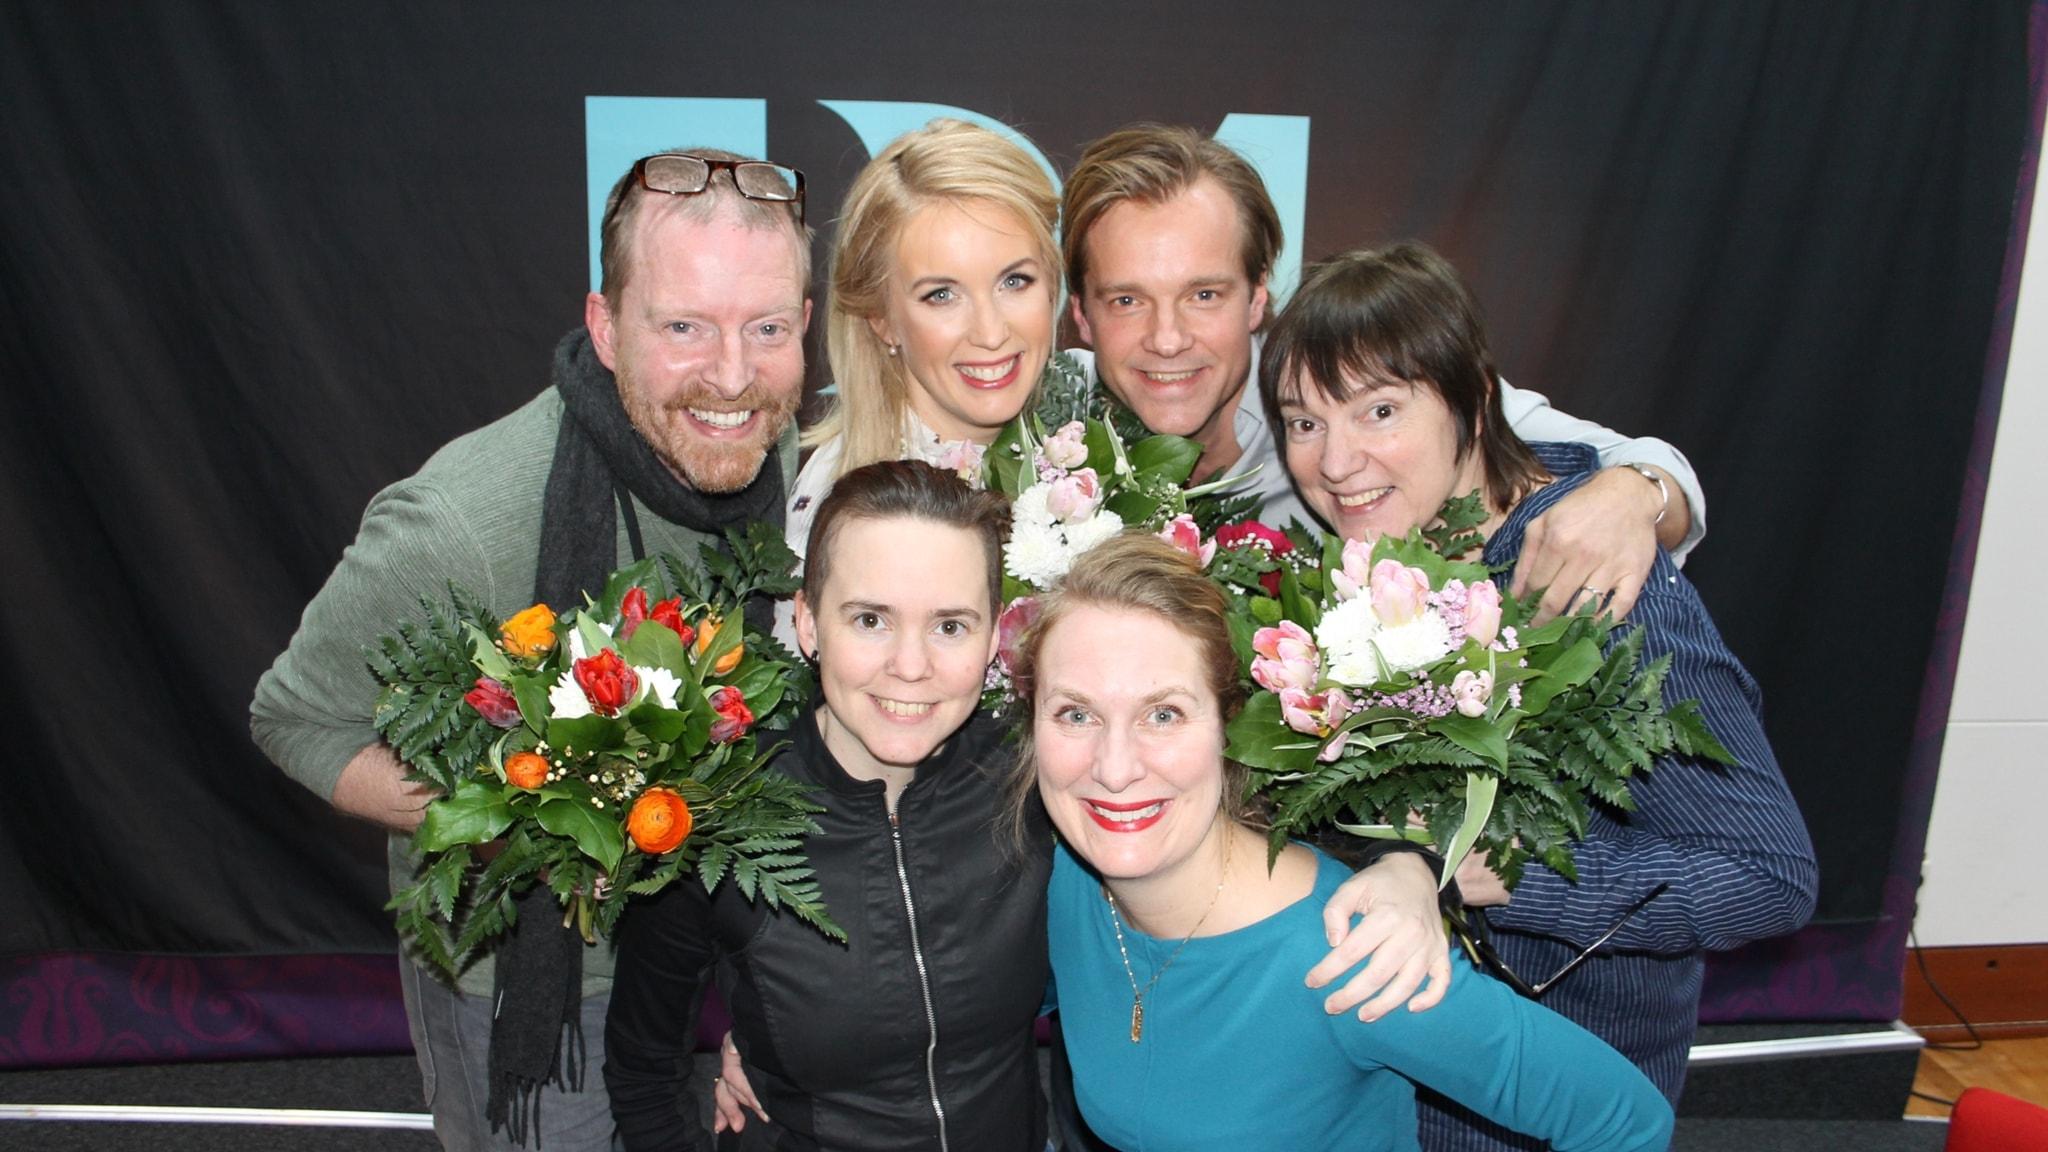 Lotta Bromé, Martin Svenningsen, Jenny Strömstedt och Henrik Johnsson i Lantzkampen!